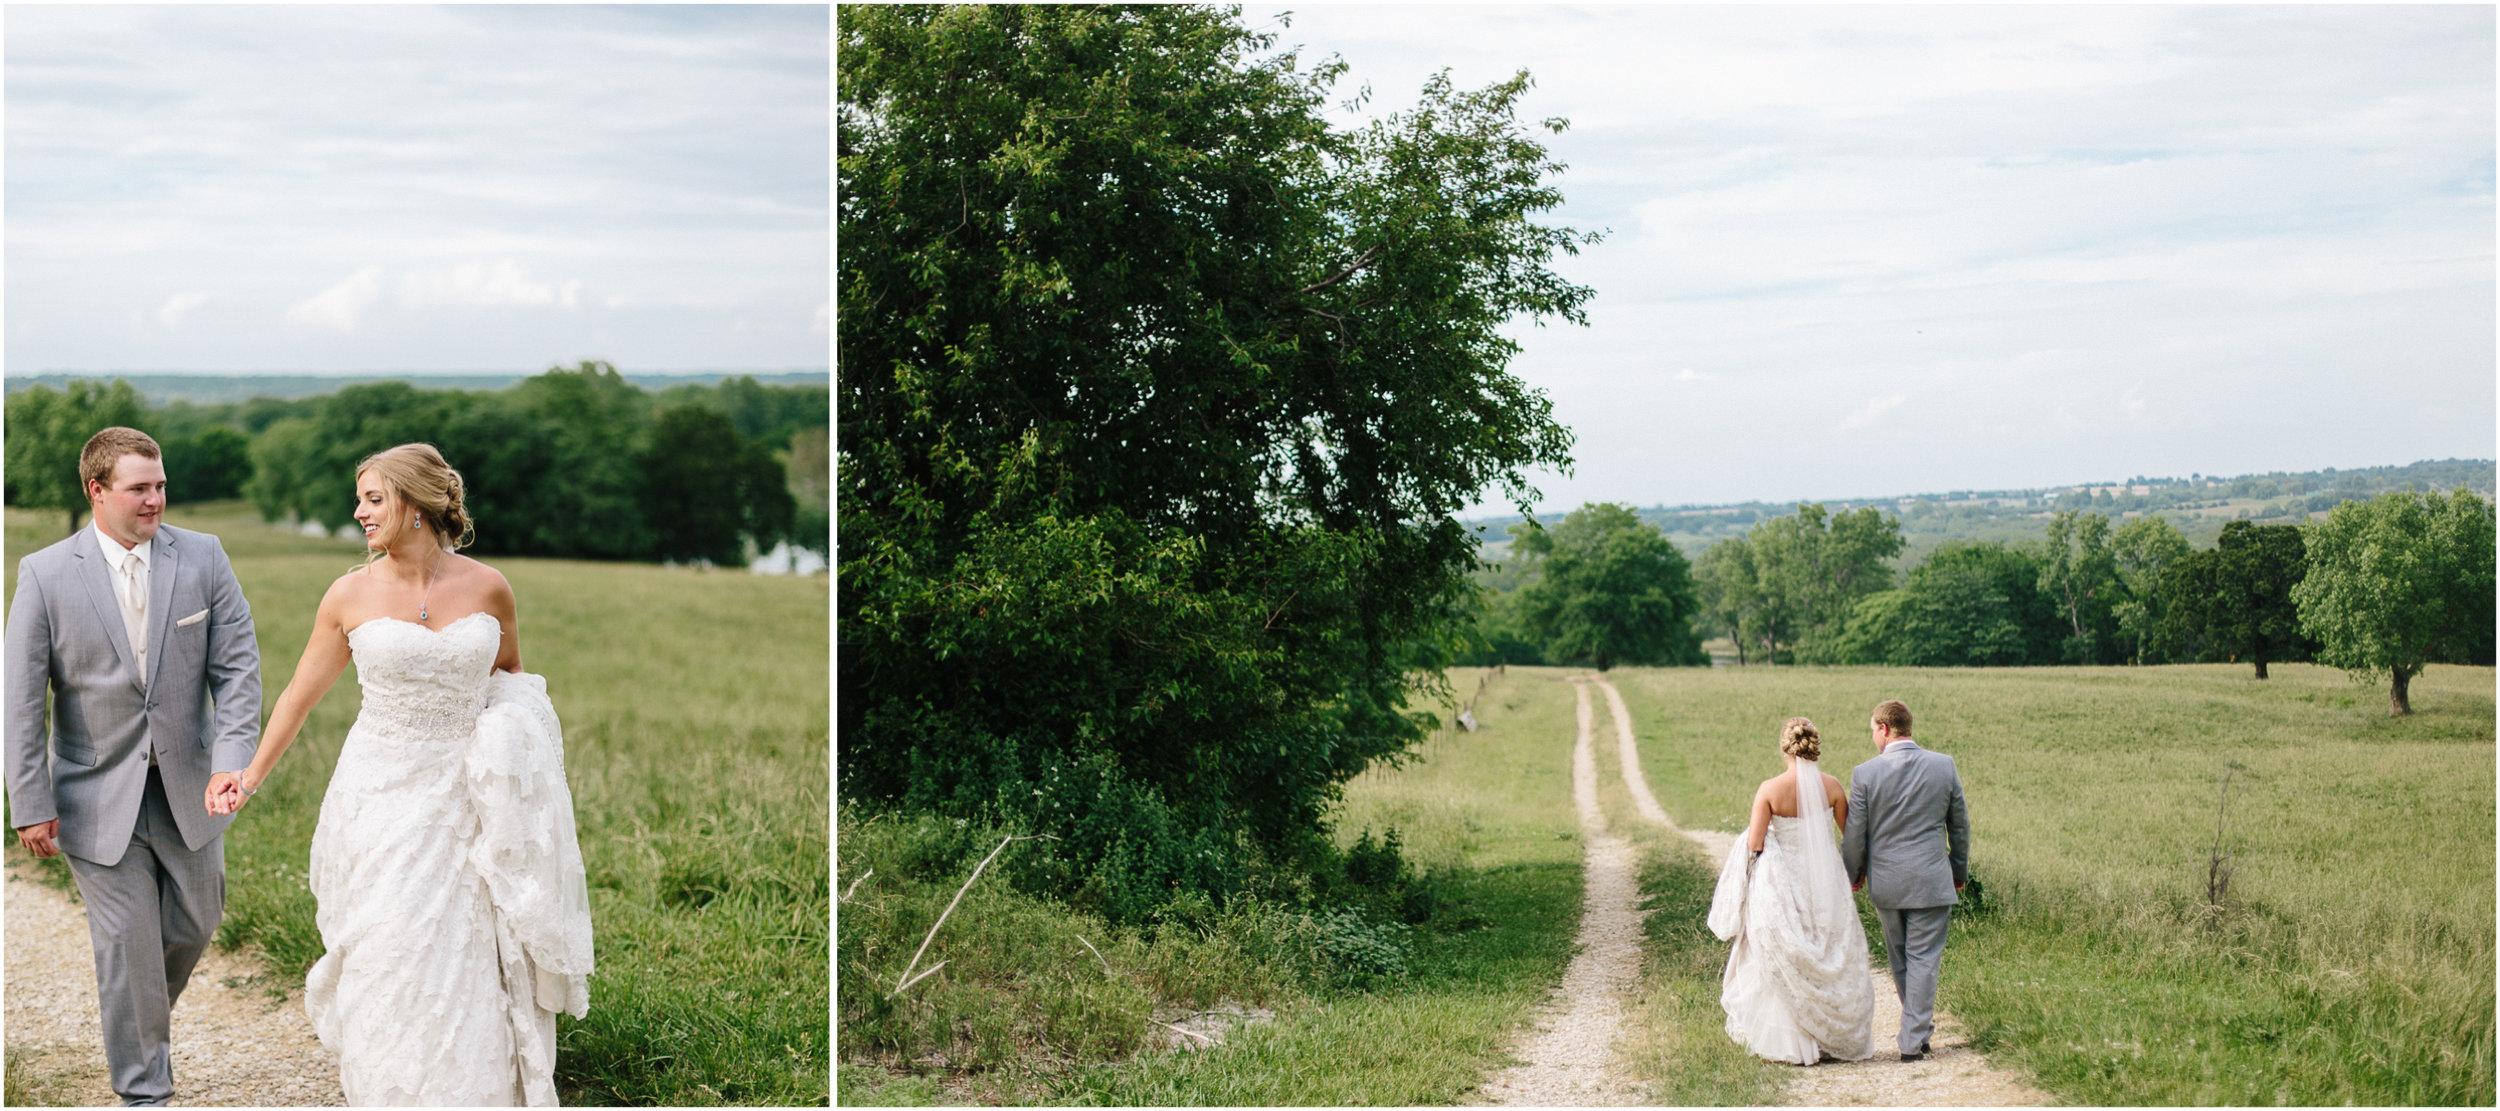 alyssa barletter photography louisburg kansas town square paola rustic wedding-37.jpg